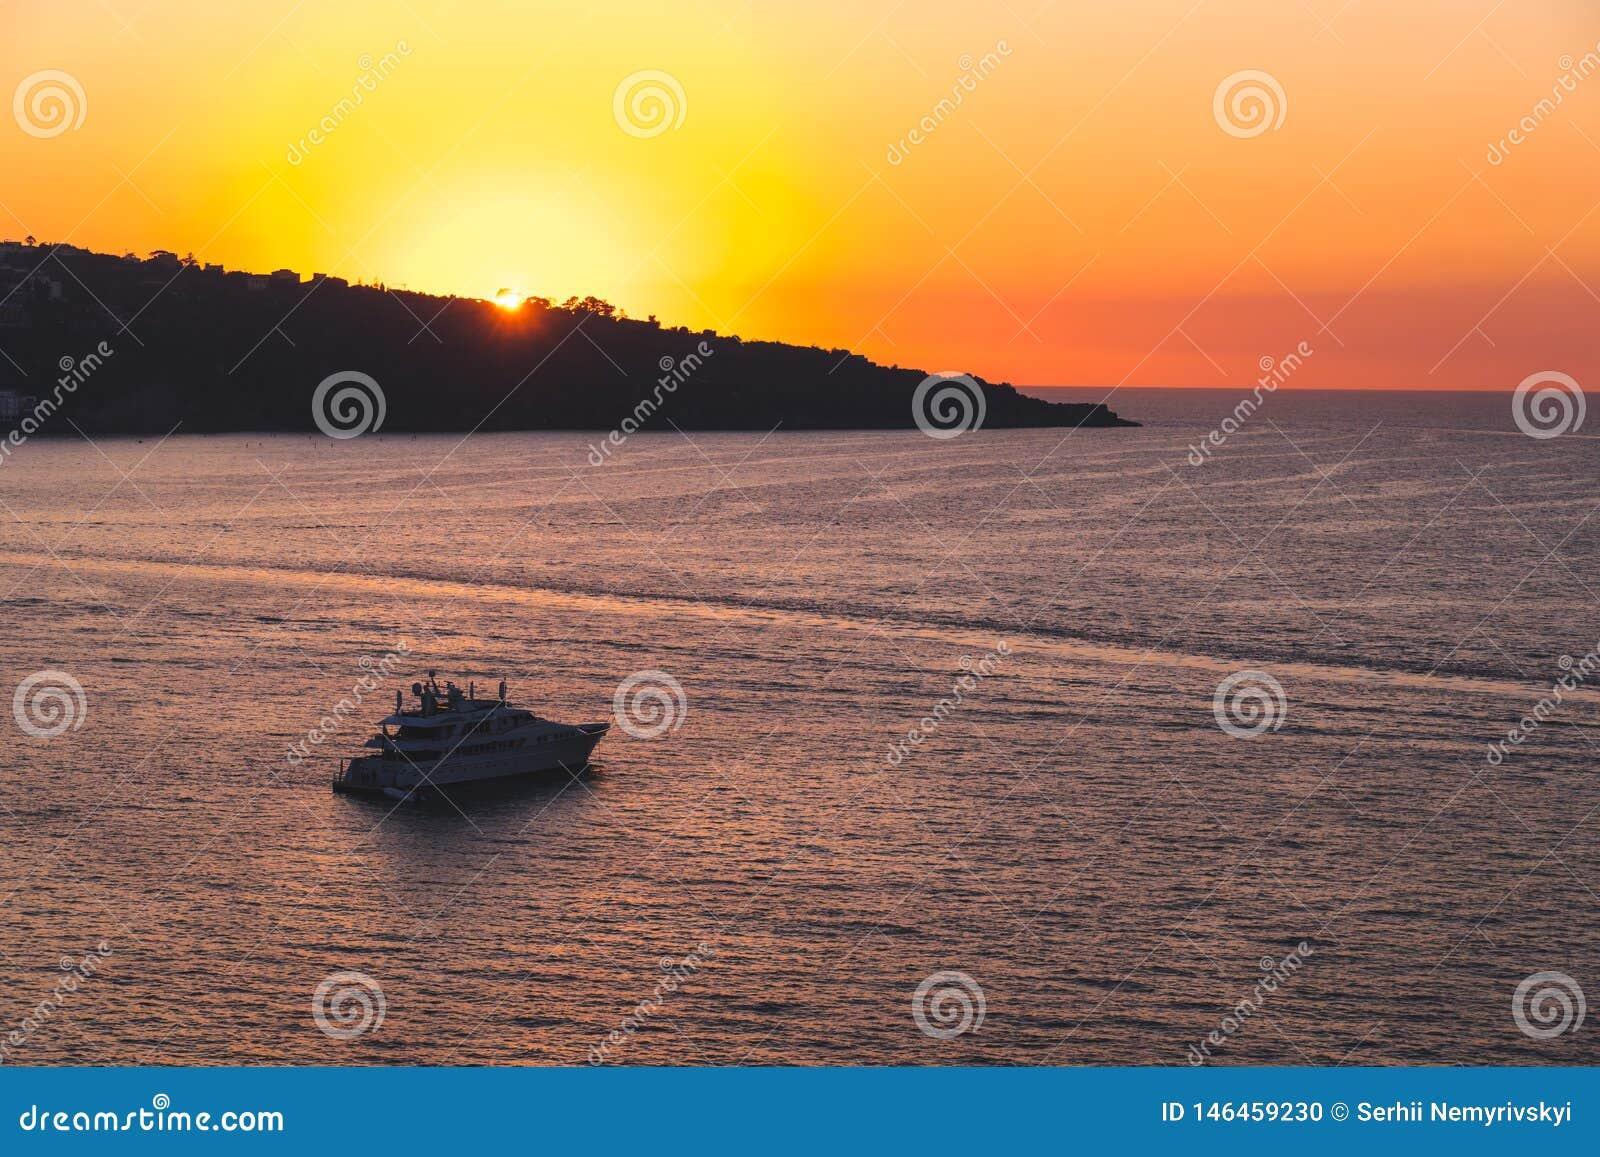 Den lyxiga seglingen f?r skeppet f?r kryssninghaveyeliner fr?n port p? soluppg?ng, solnedg?ngen, den Italien Sorrento fj?rden, lo